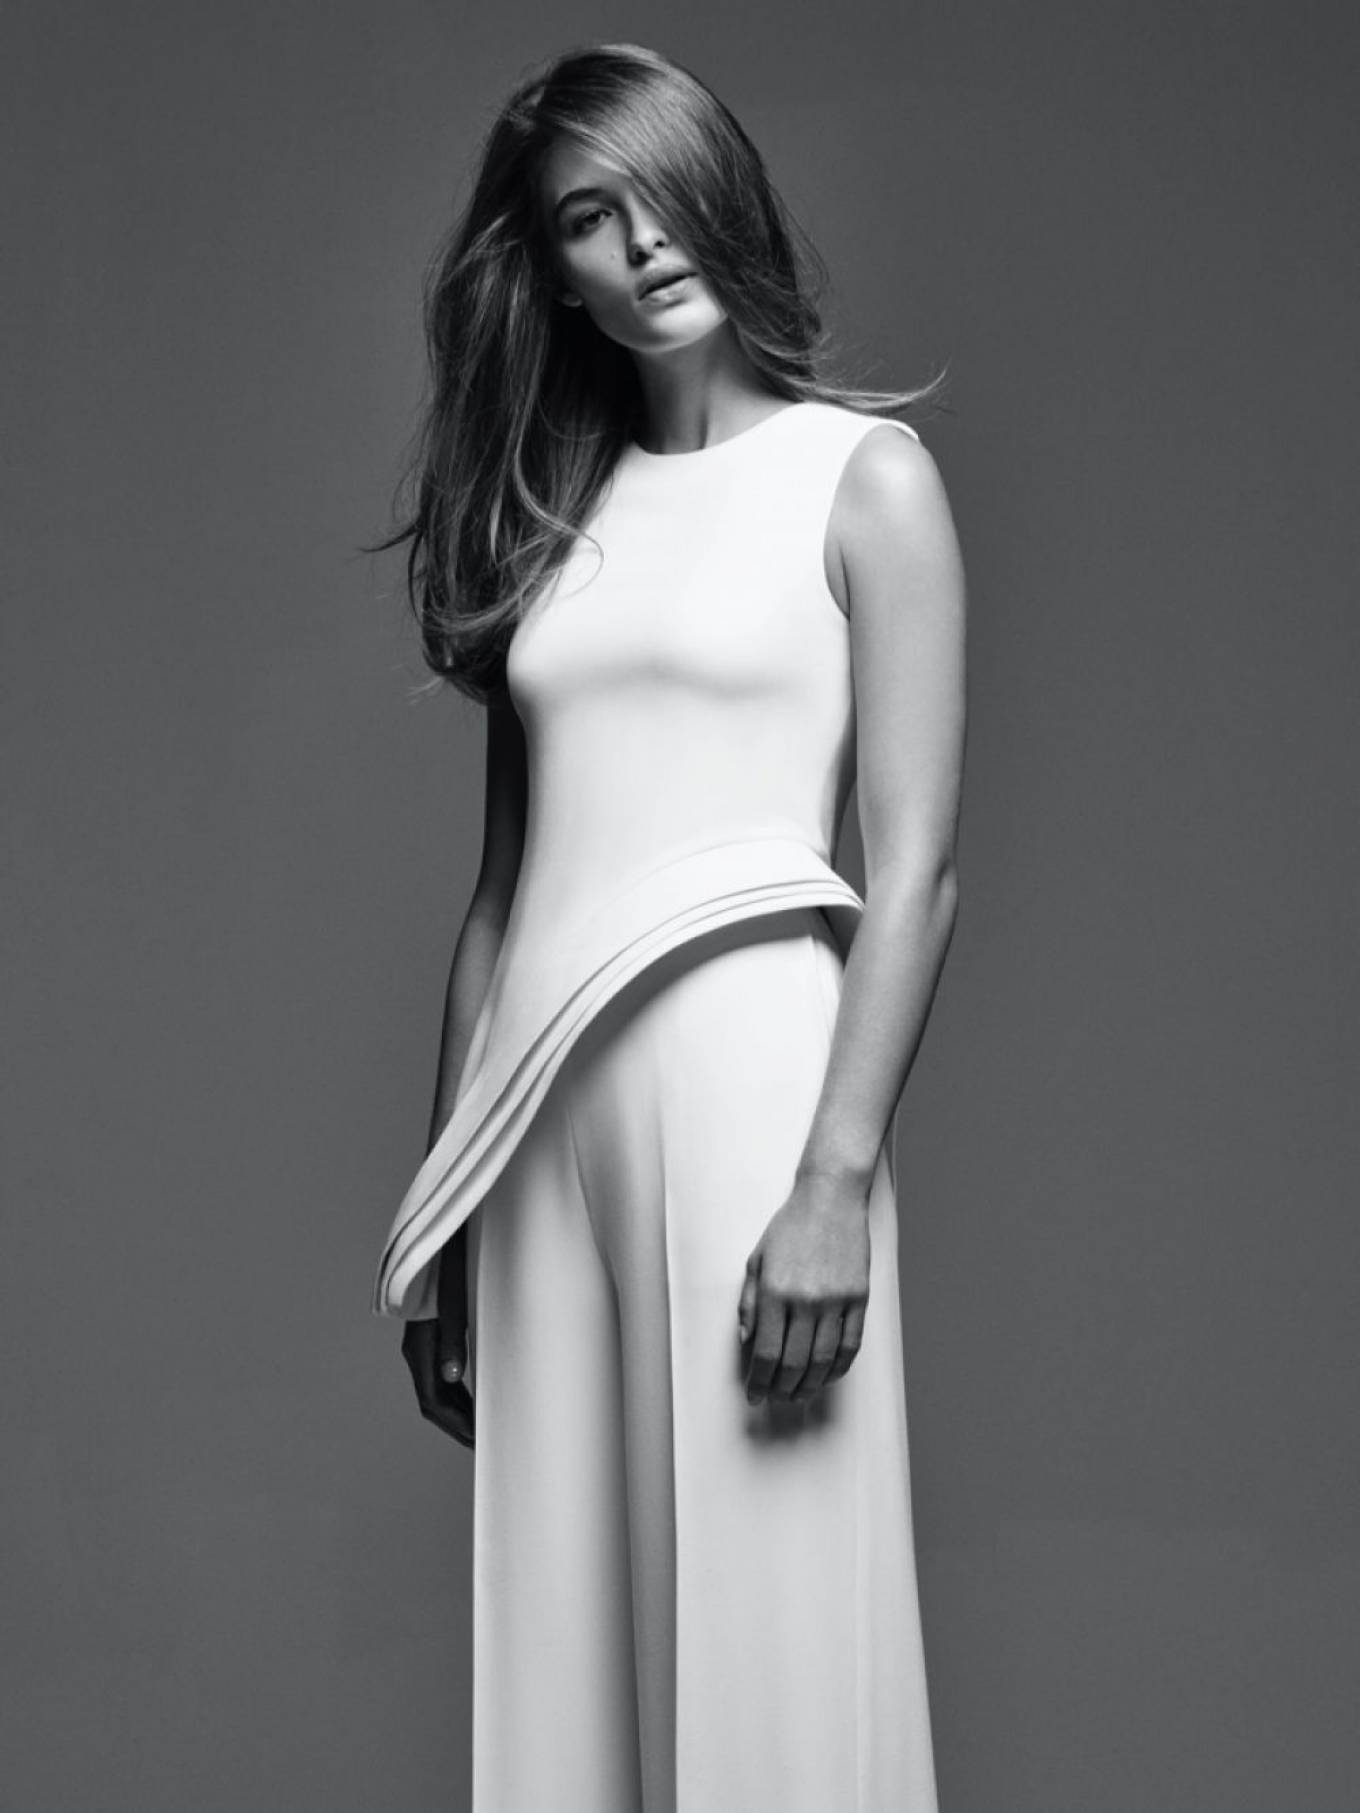 Grace Elizabeth - Photoshoot For Brandon Maxwell 2020